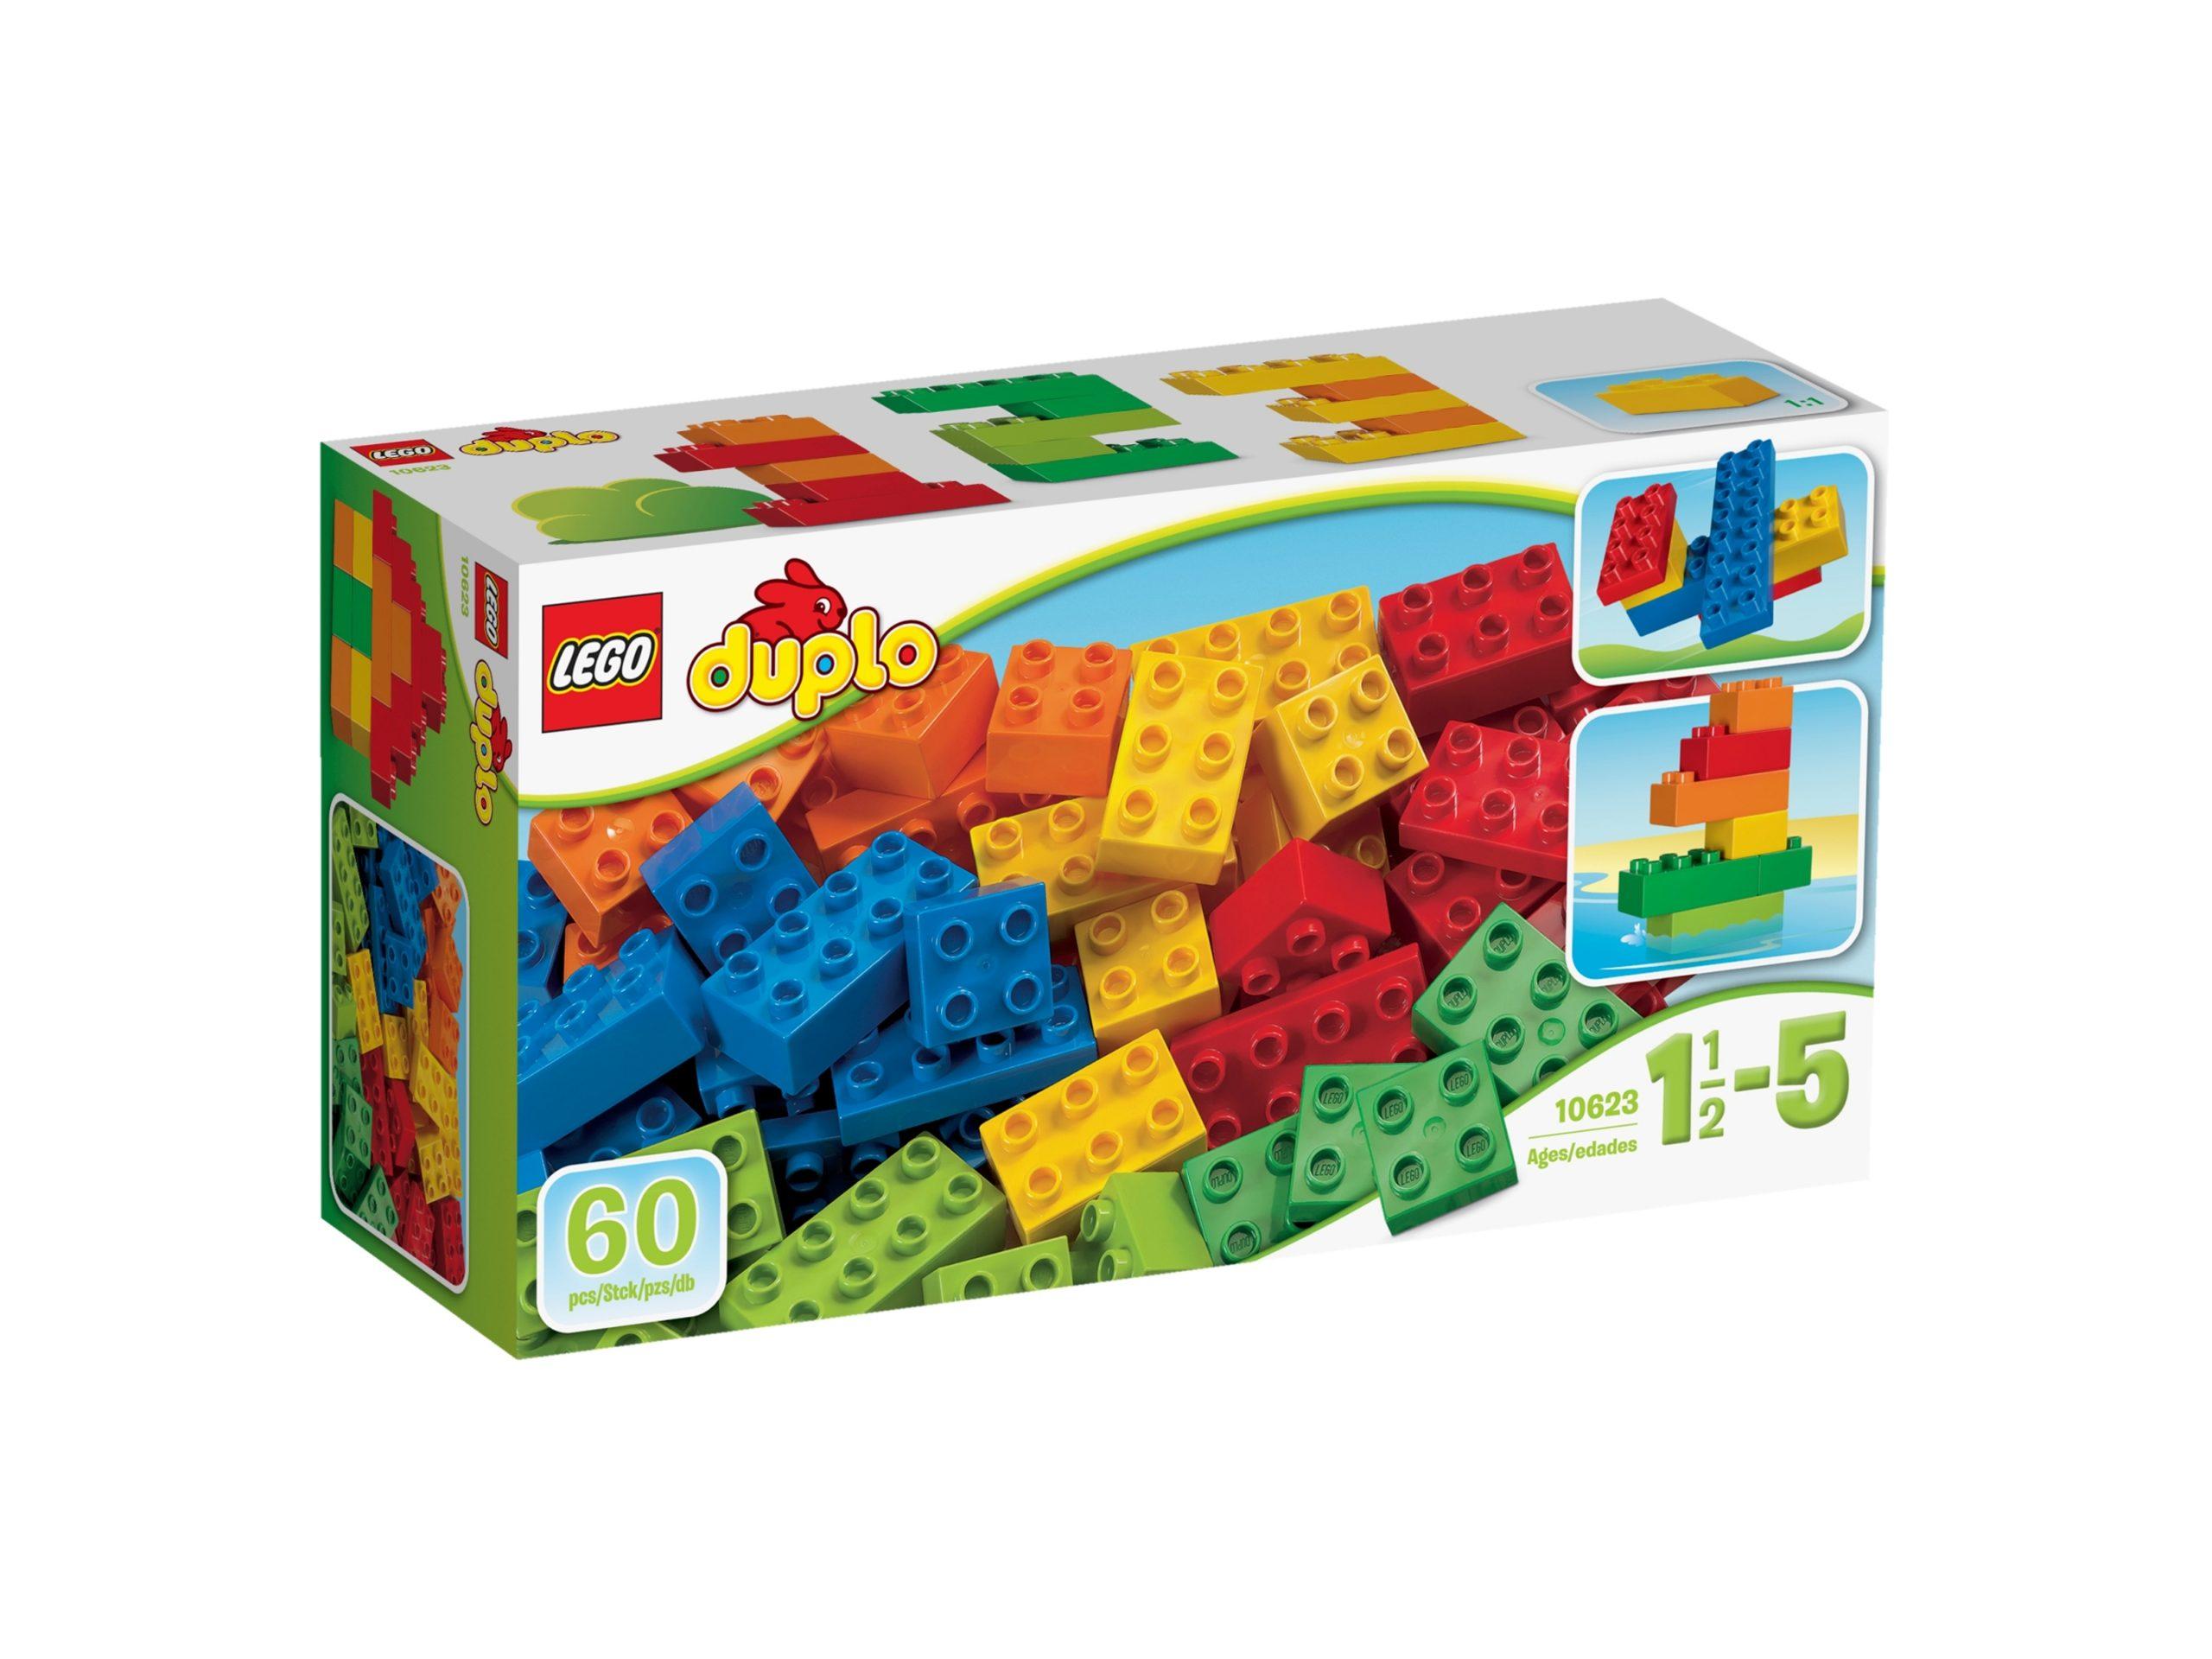 grande boite de complement lego 10623 duplo 10623 scaled